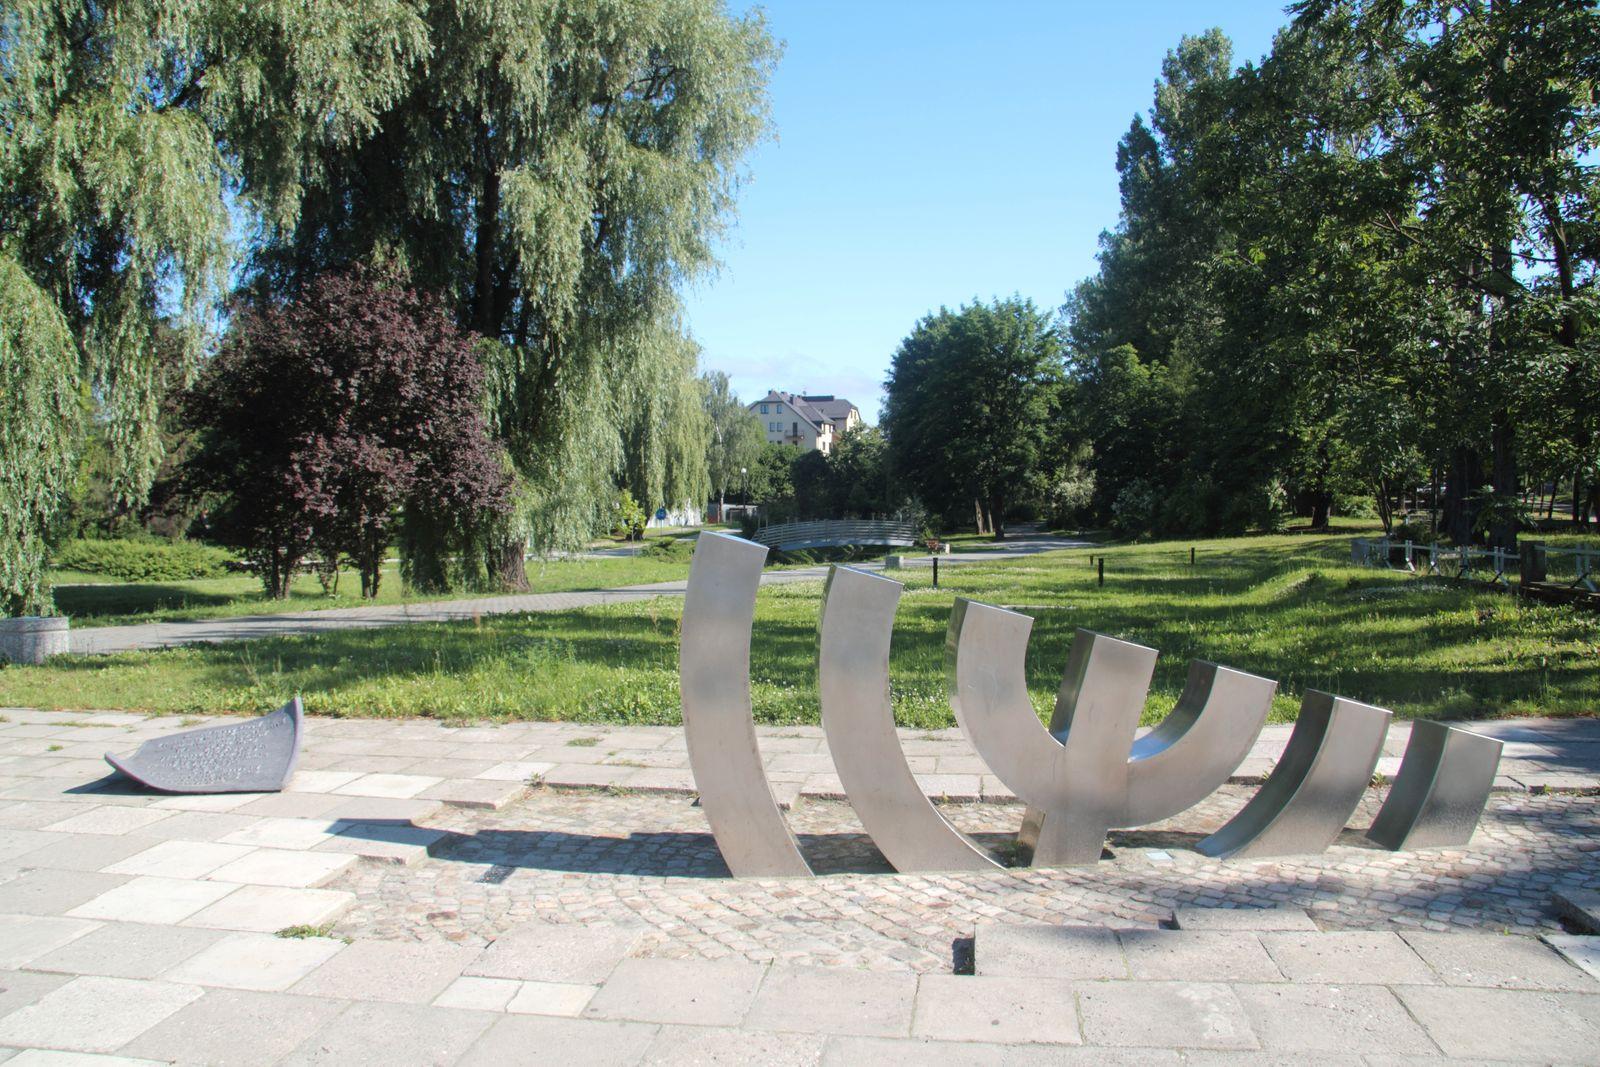 Jewish Menorah, partially buried, commemorating the Kielce pogrom against the Jewish community, Poland